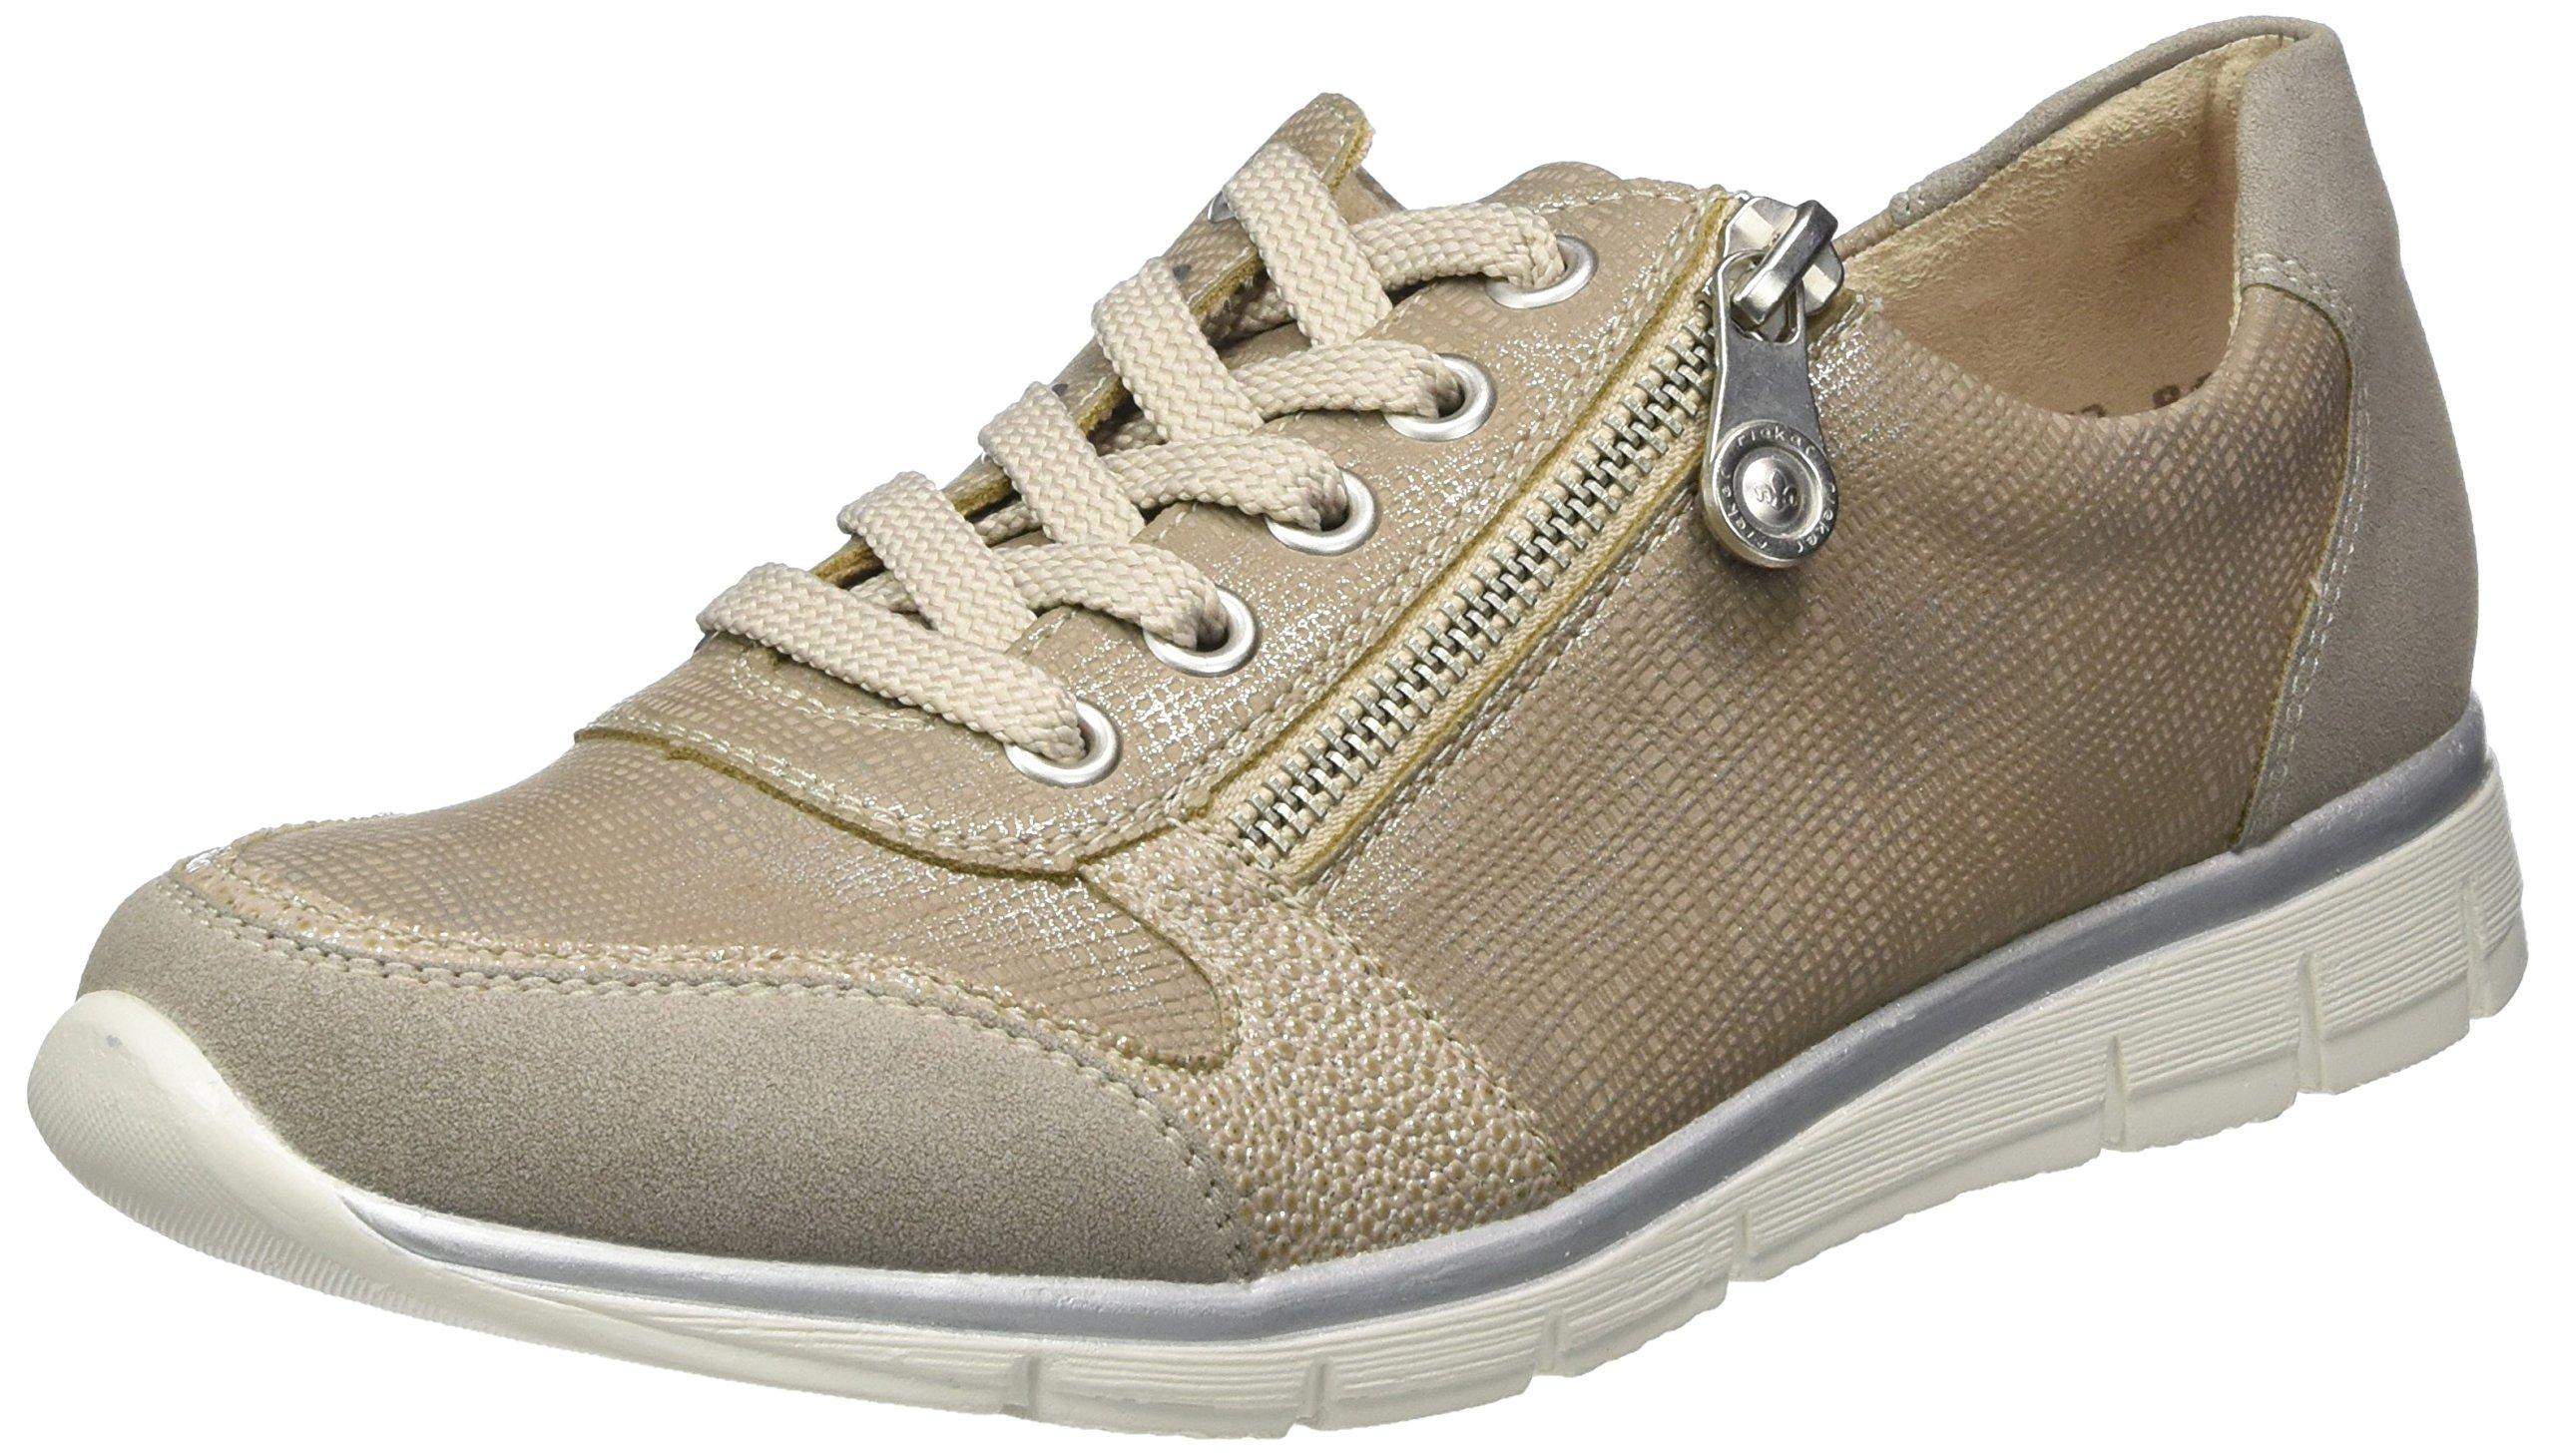 Rieker womens lace up shoes vapor/pearl-silver/fango-silver size 9.5 B(M) US